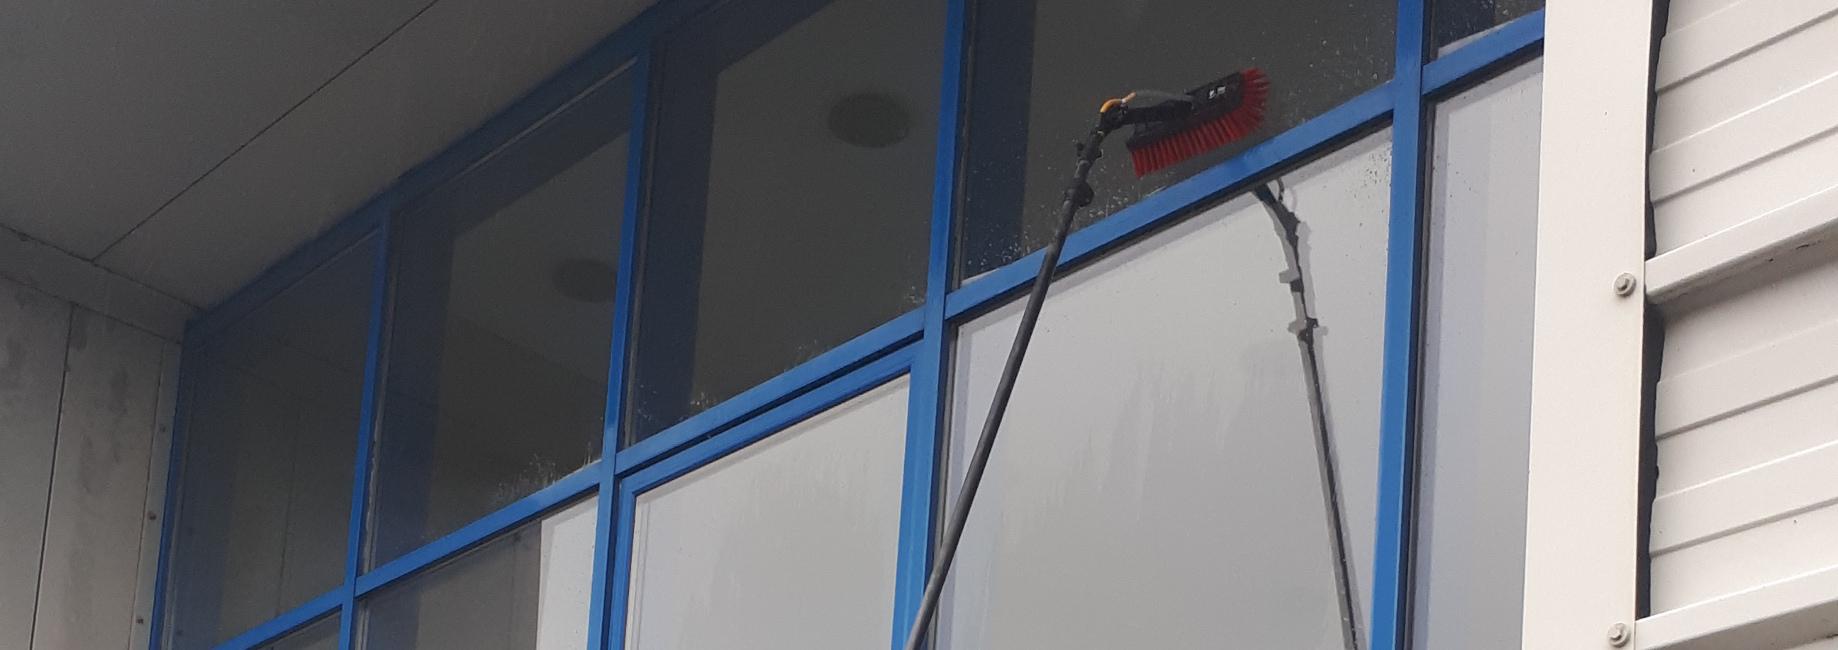 window-washer4